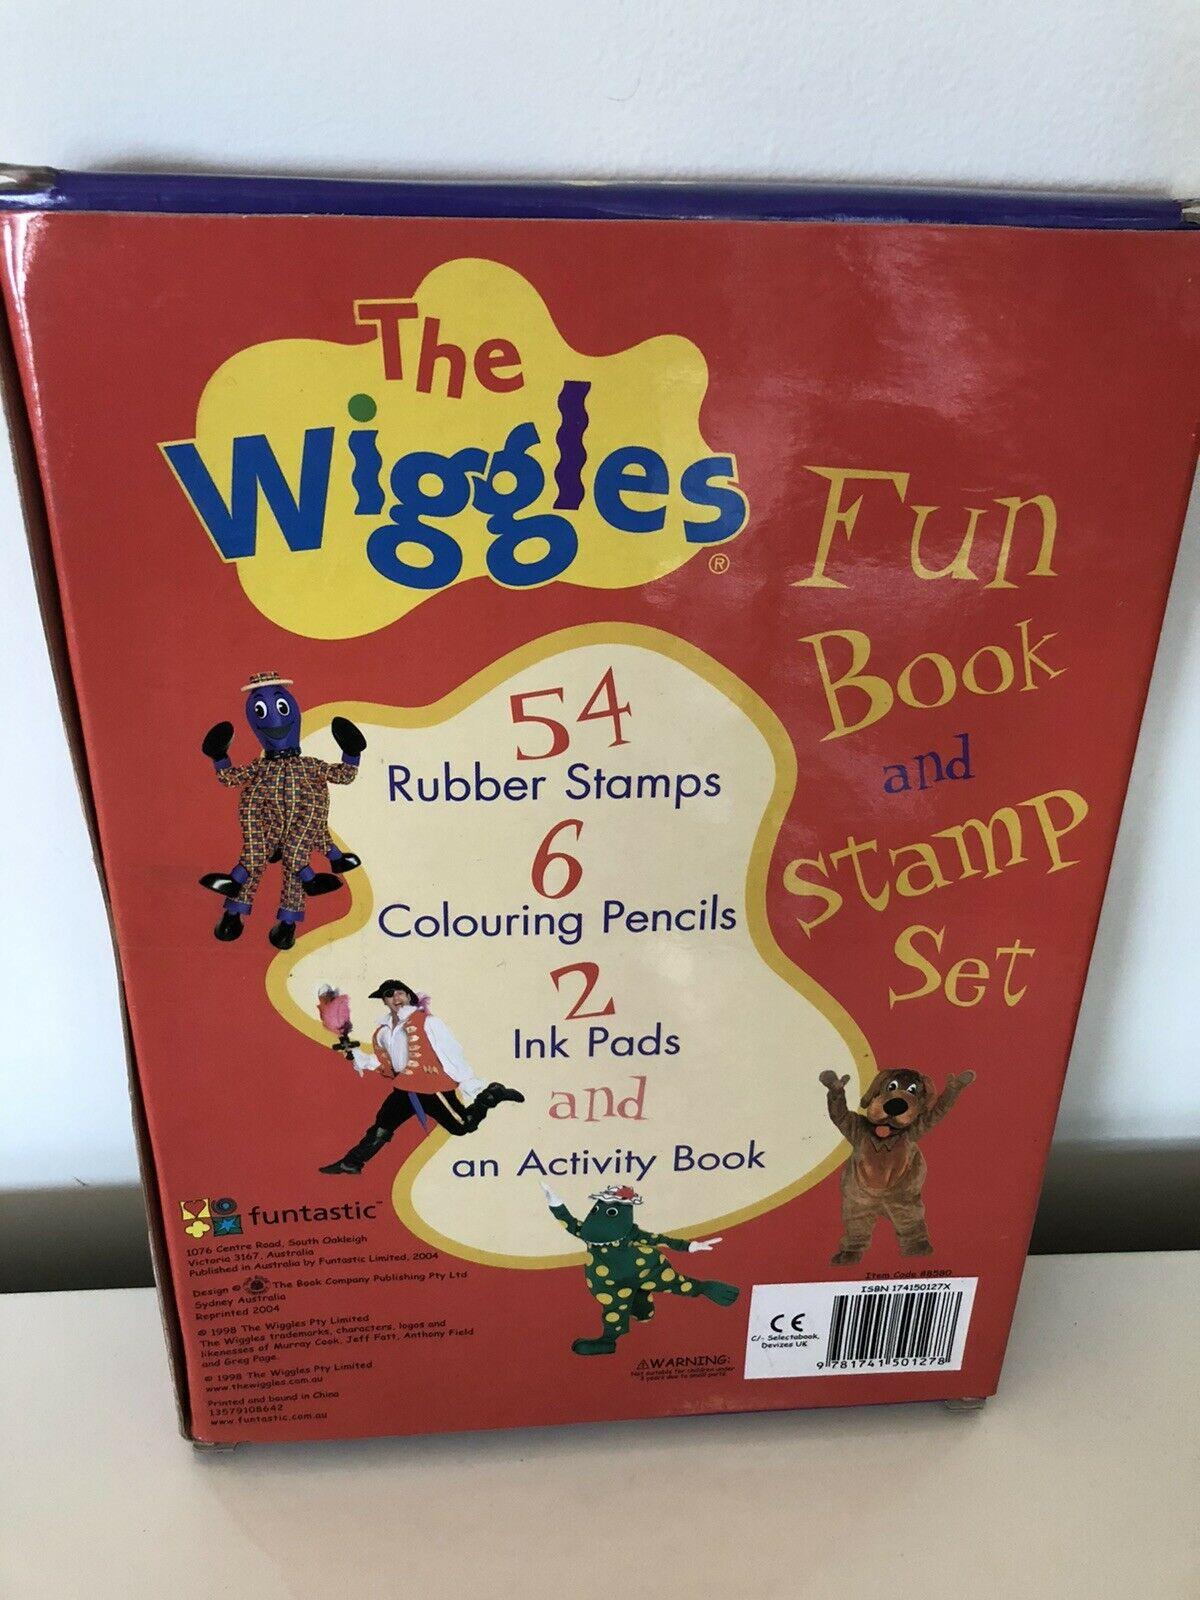 Fun Book and Stamp Set